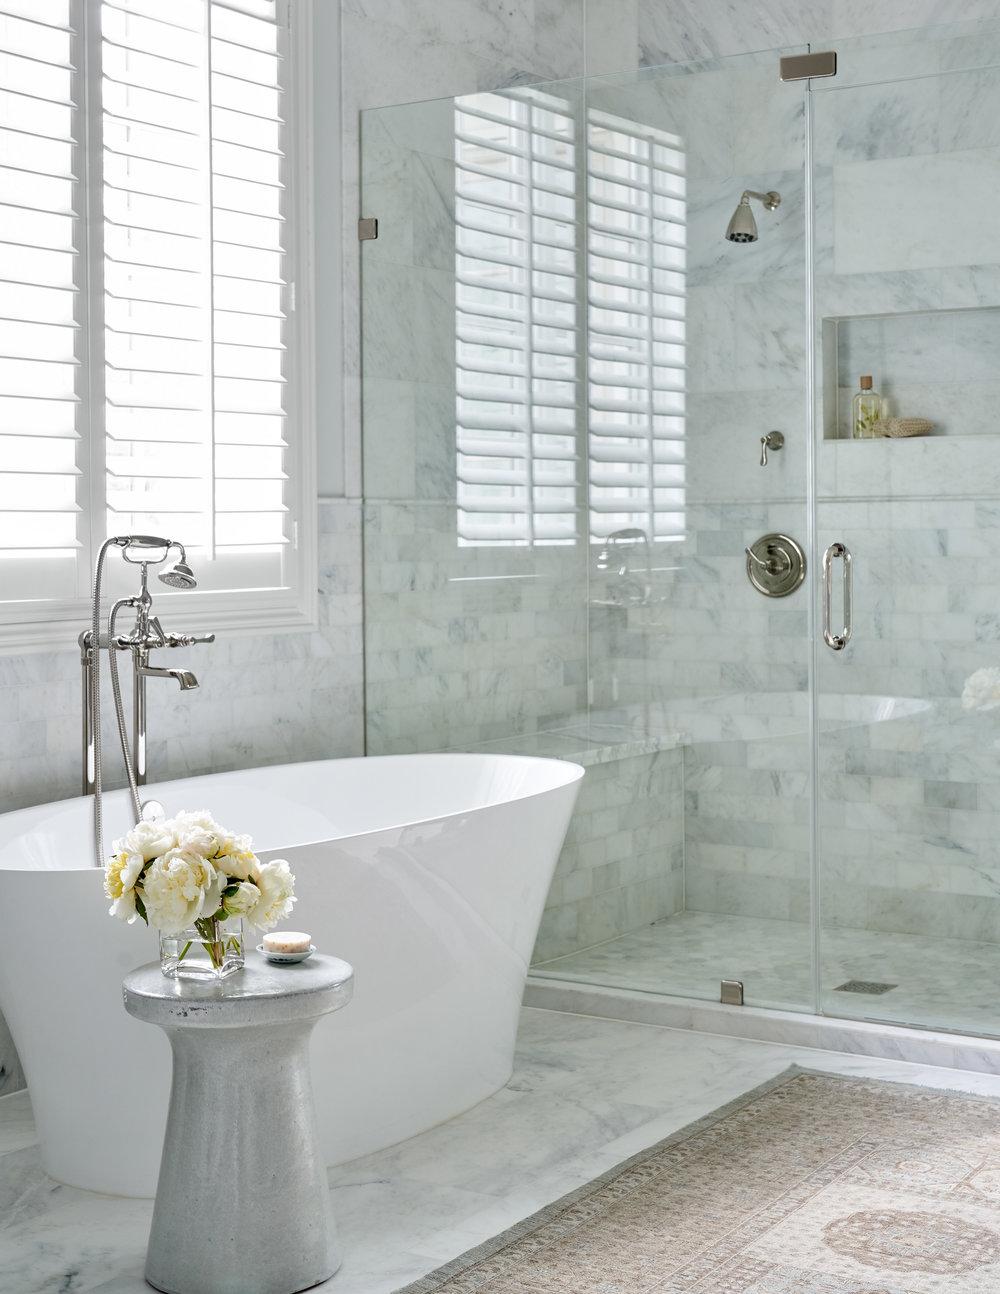 Bathroom designed by Beth Lindsey Interior Design.